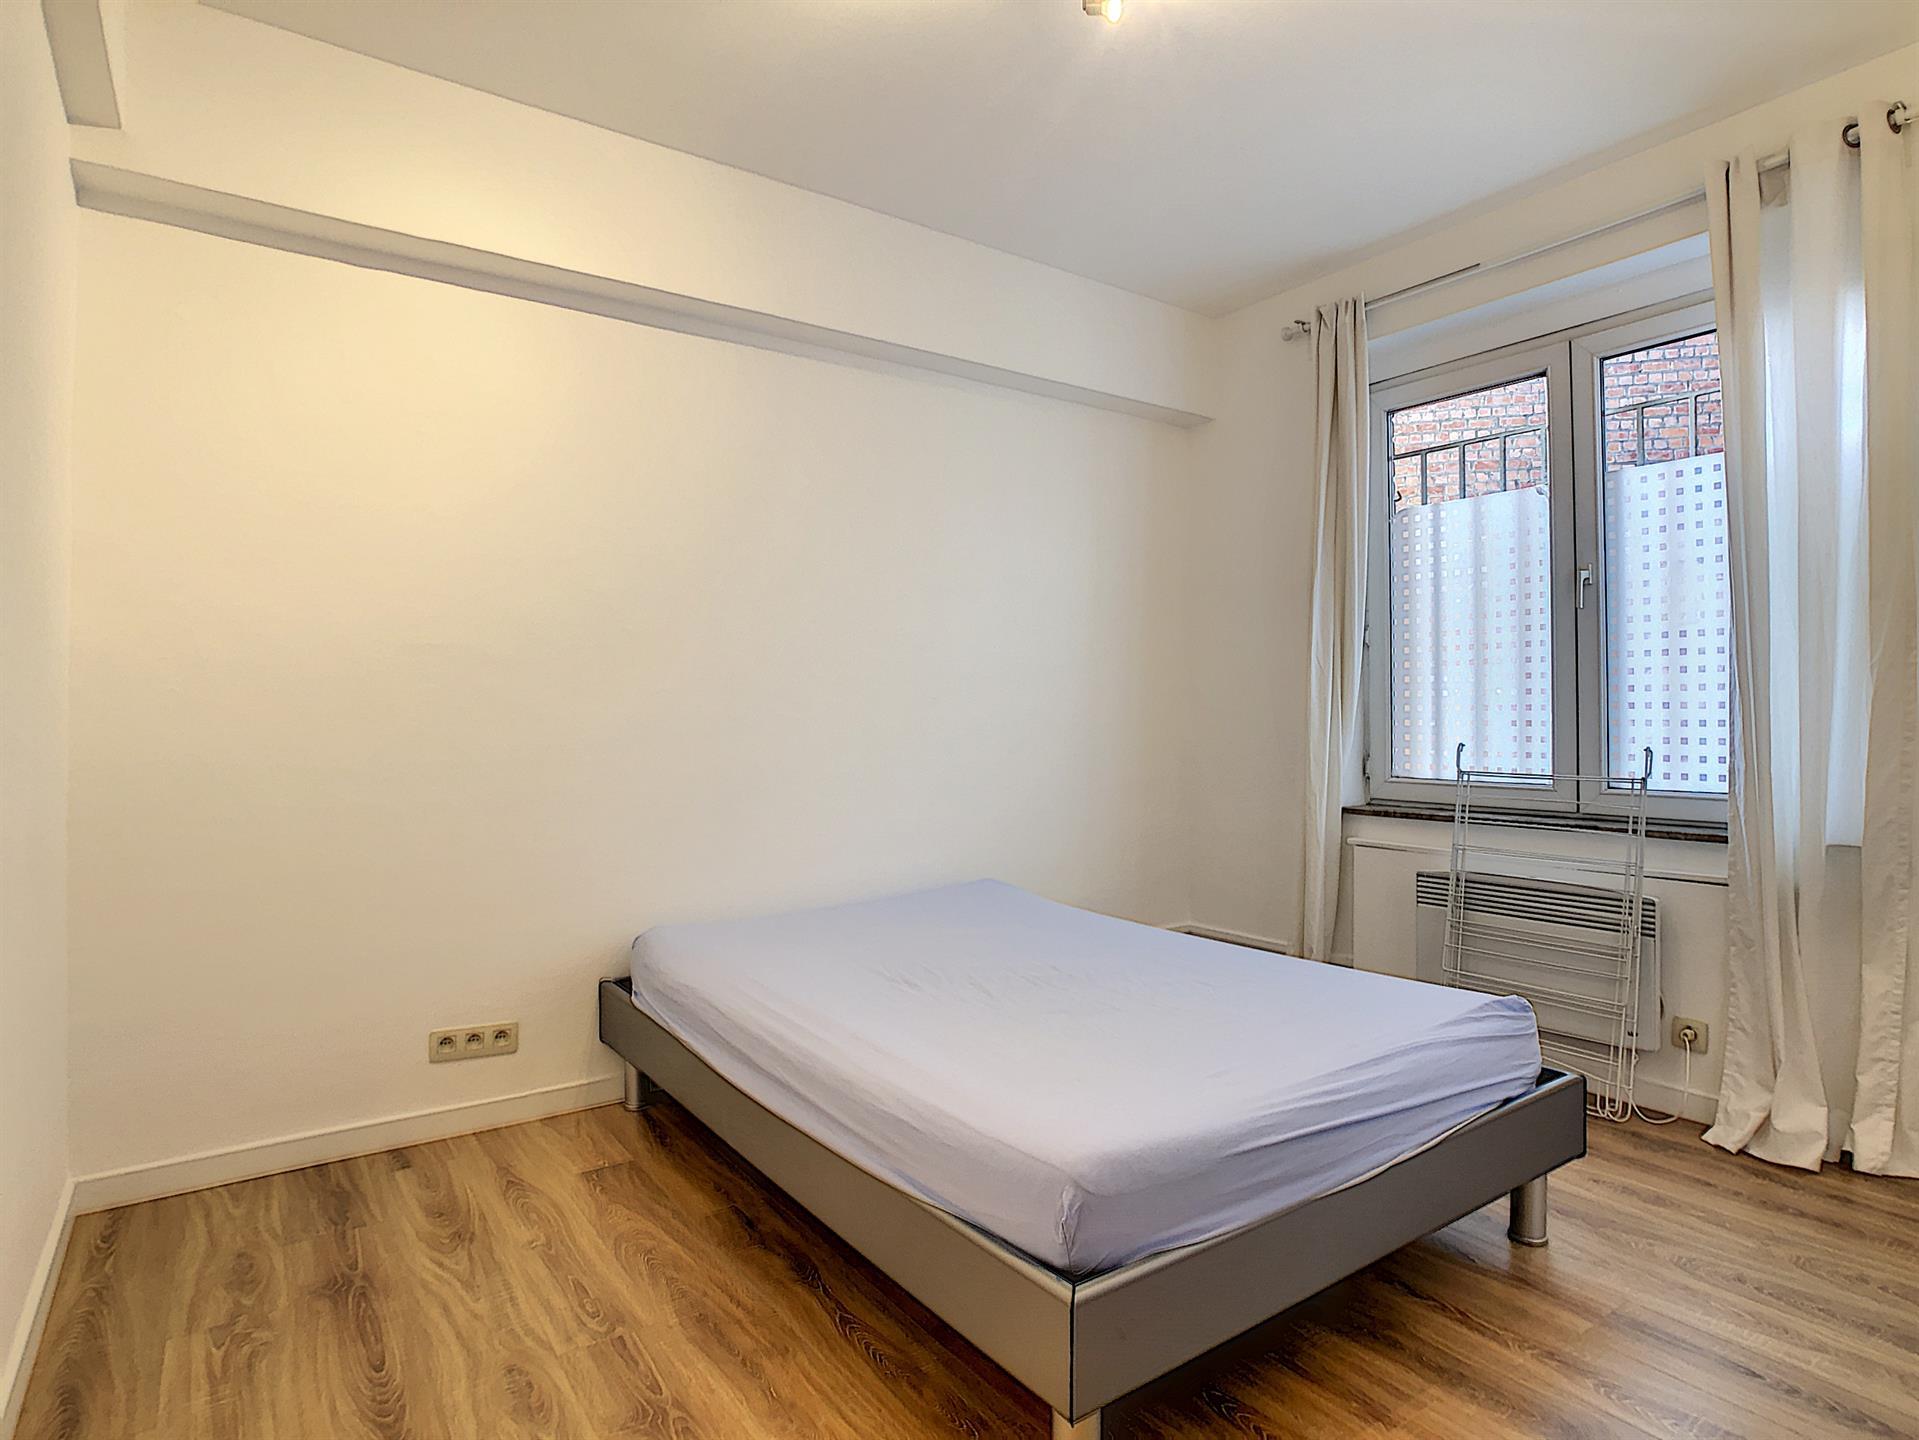 Appartement - Sint-Gillis - #4202152-3